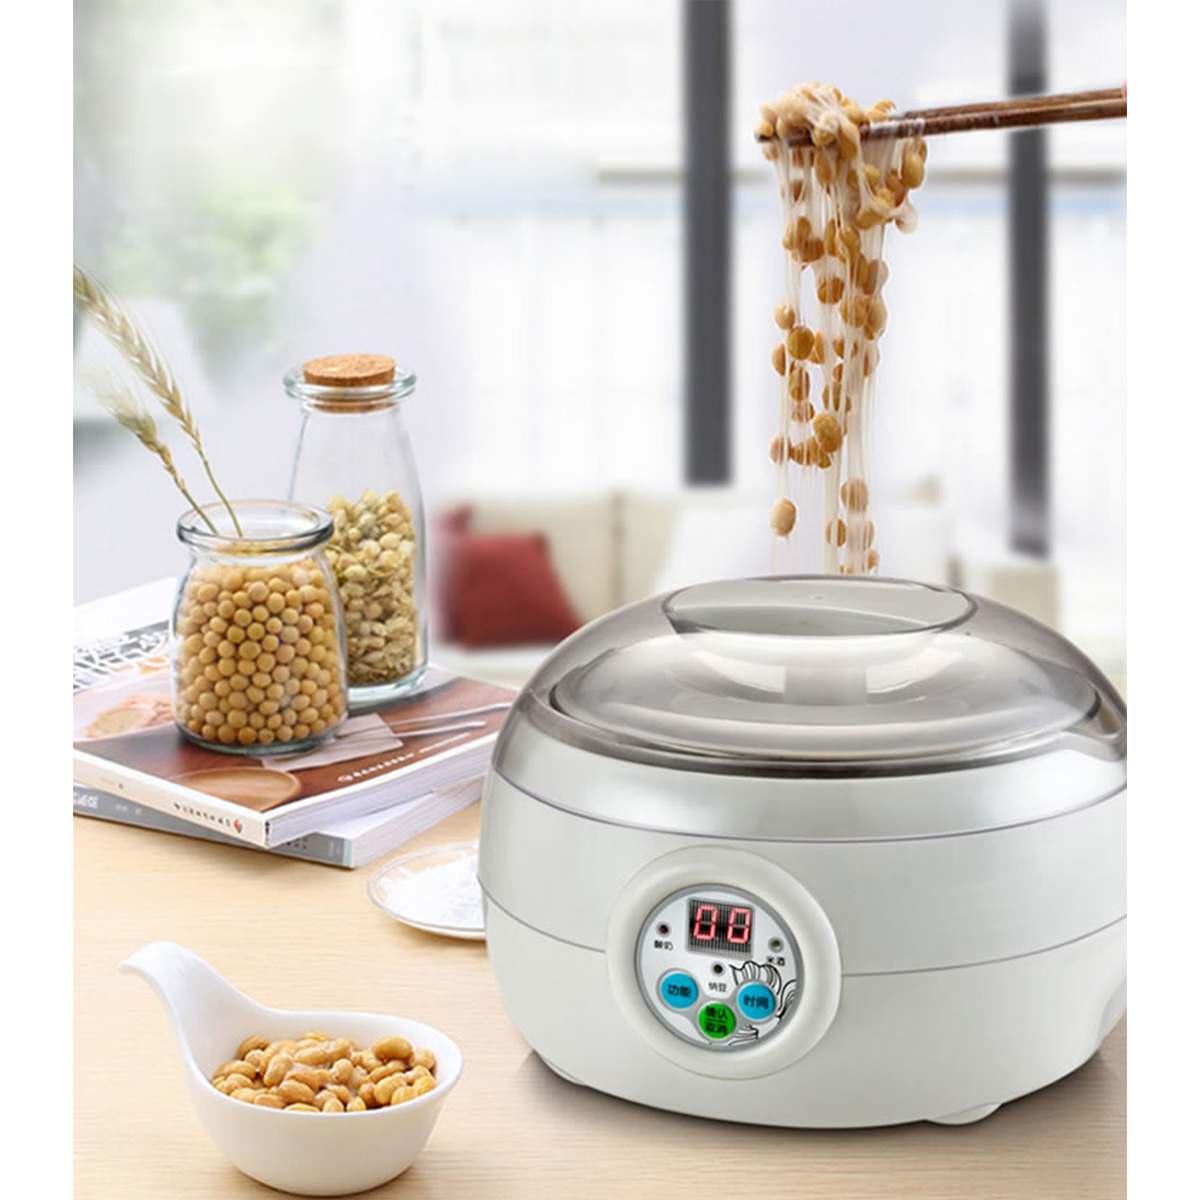 1.5L 220V 15W White Electric Automatic Yoghurt Maker Rice Wine Natto Cuisine Container Yogurt Maker Kitchen Appliance 14x21cm